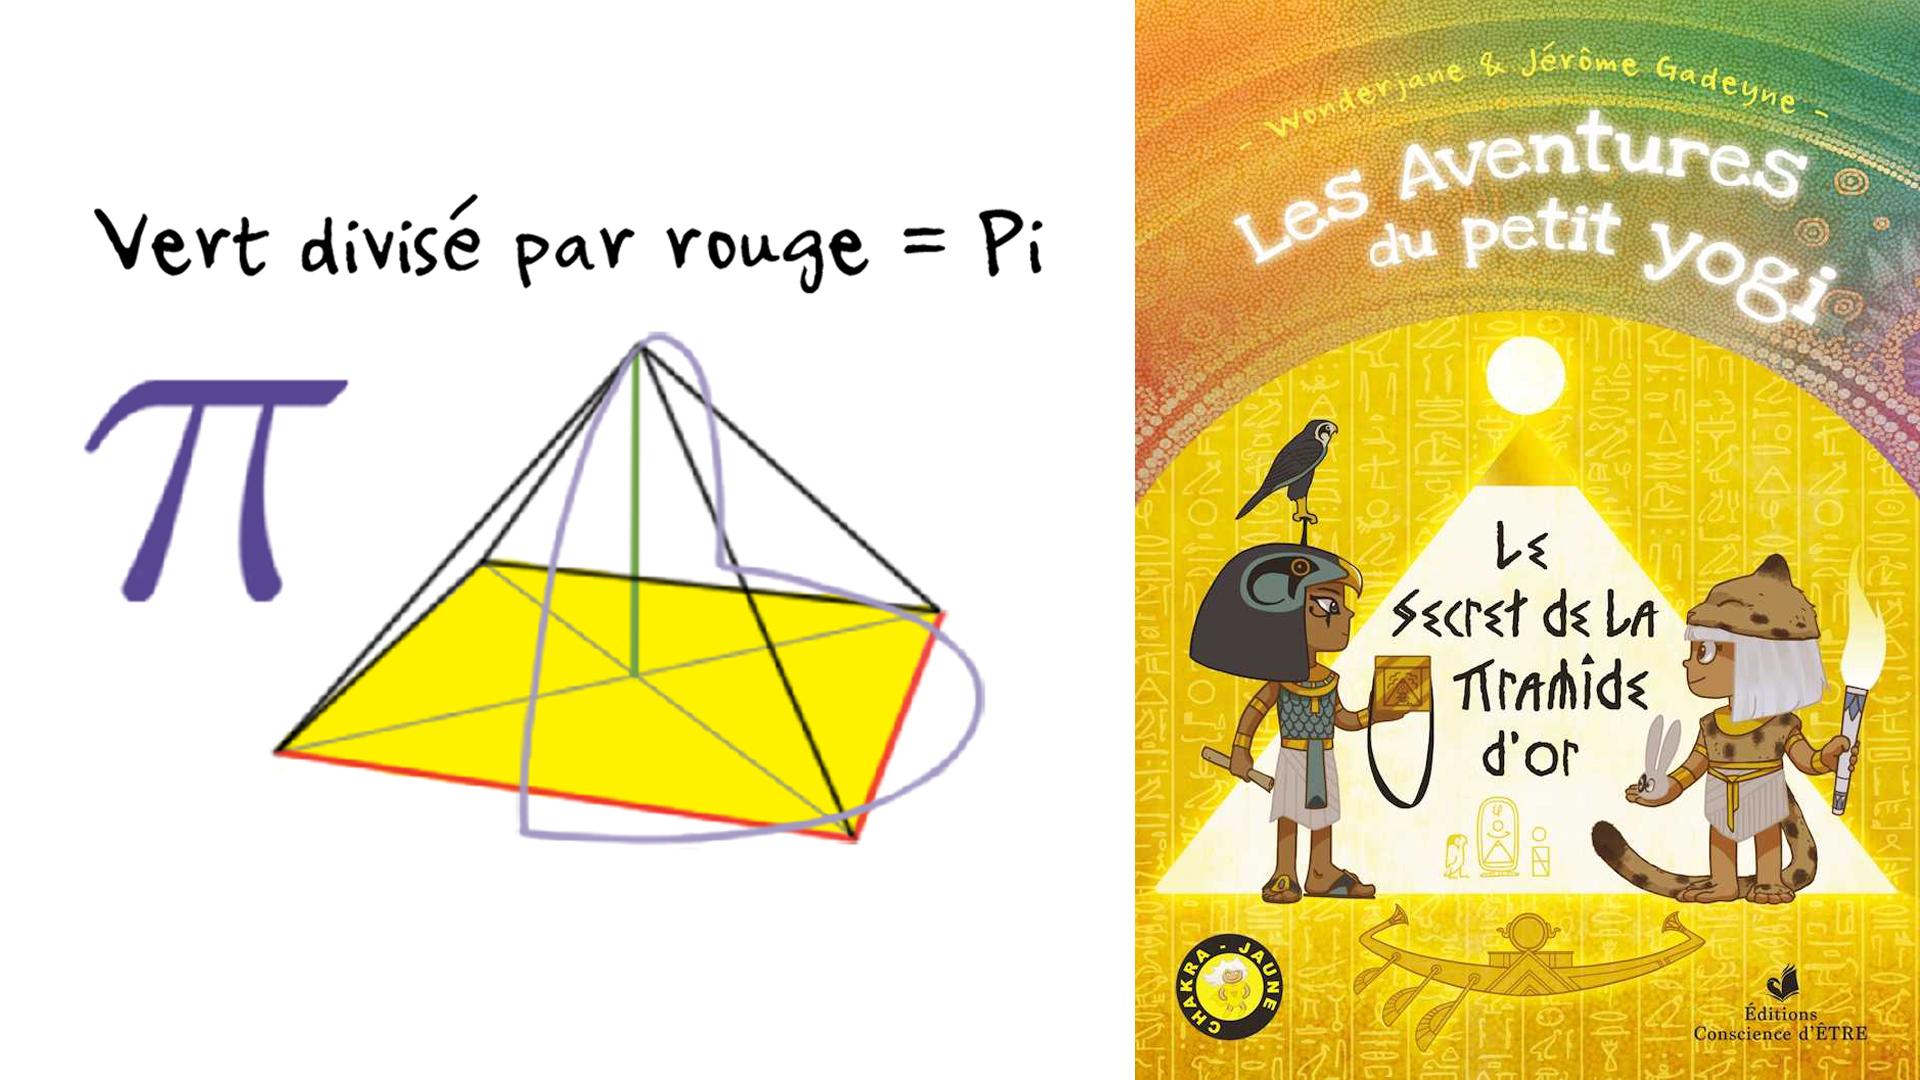 pyramide tome 4 les aventures du petit yogi